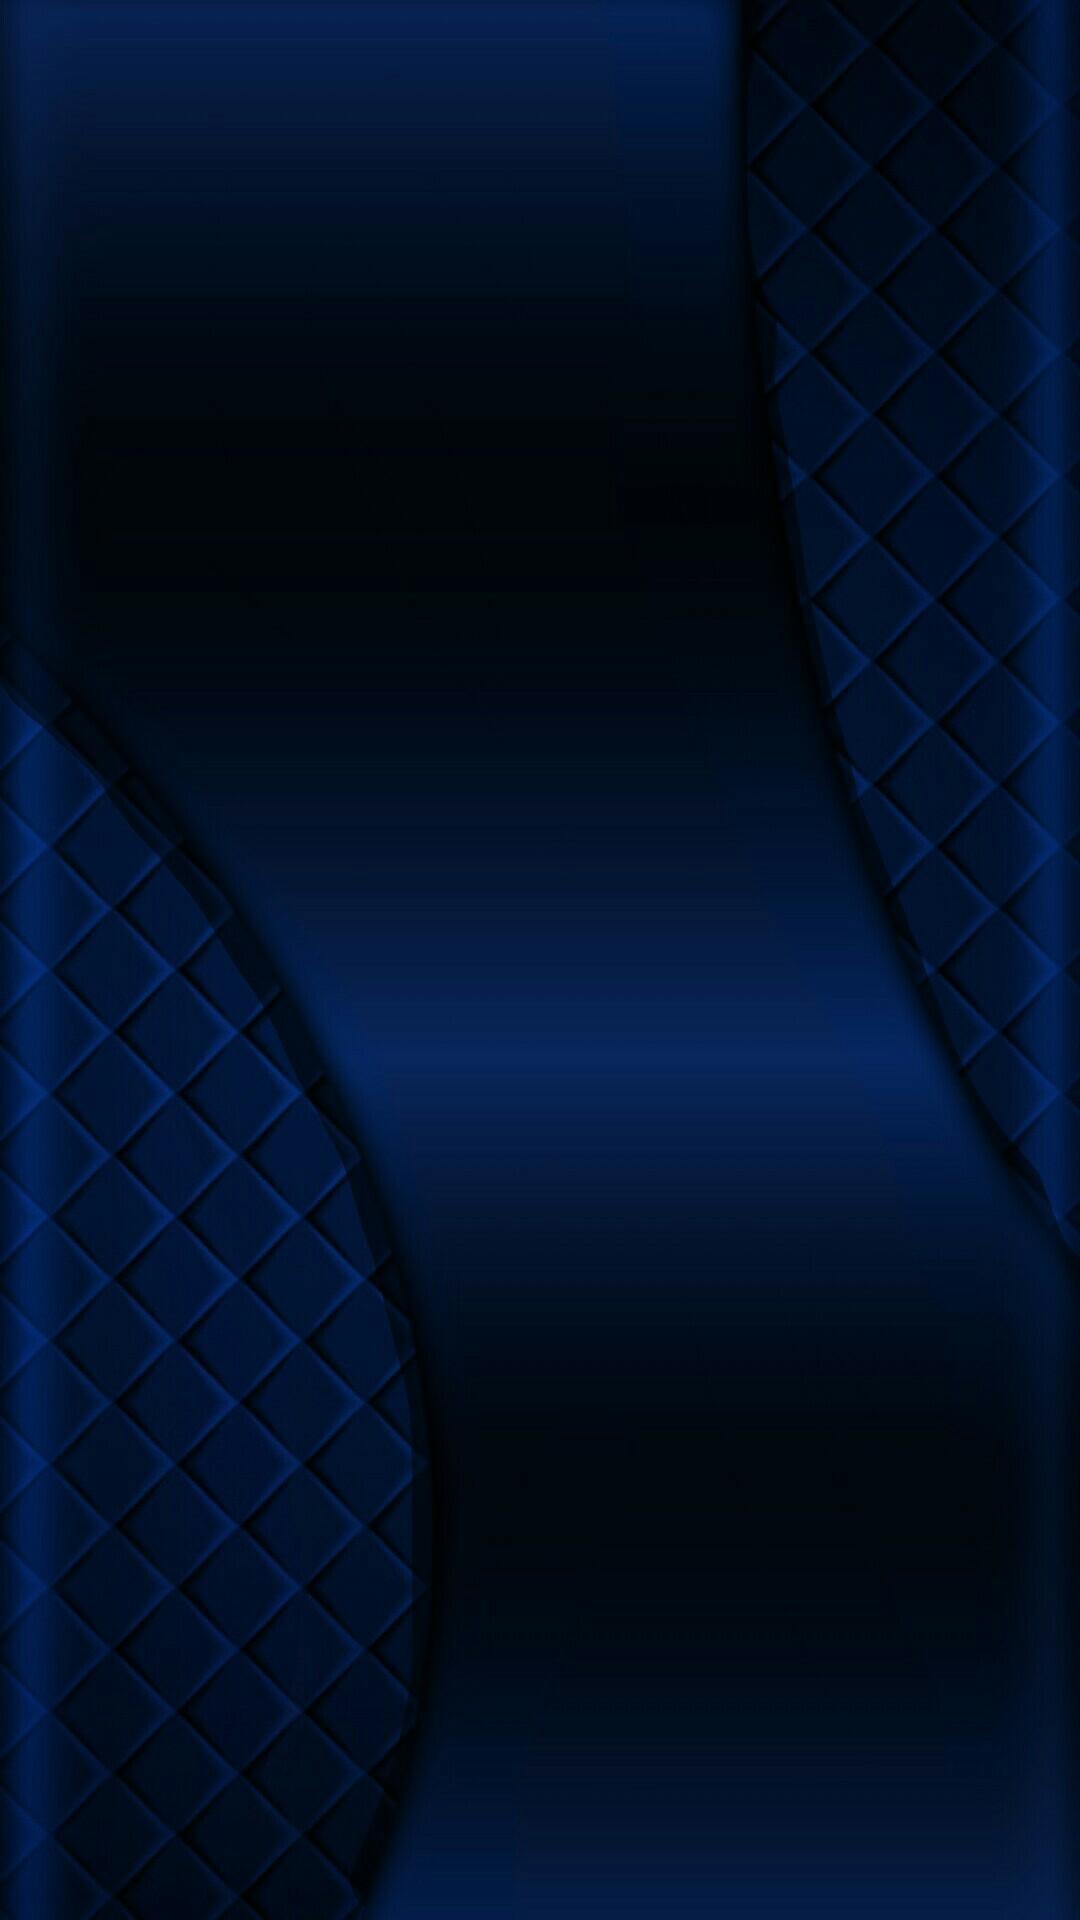 Popular Wallpaper Marble Dark Blue - 113585  Collection_808097.jpg